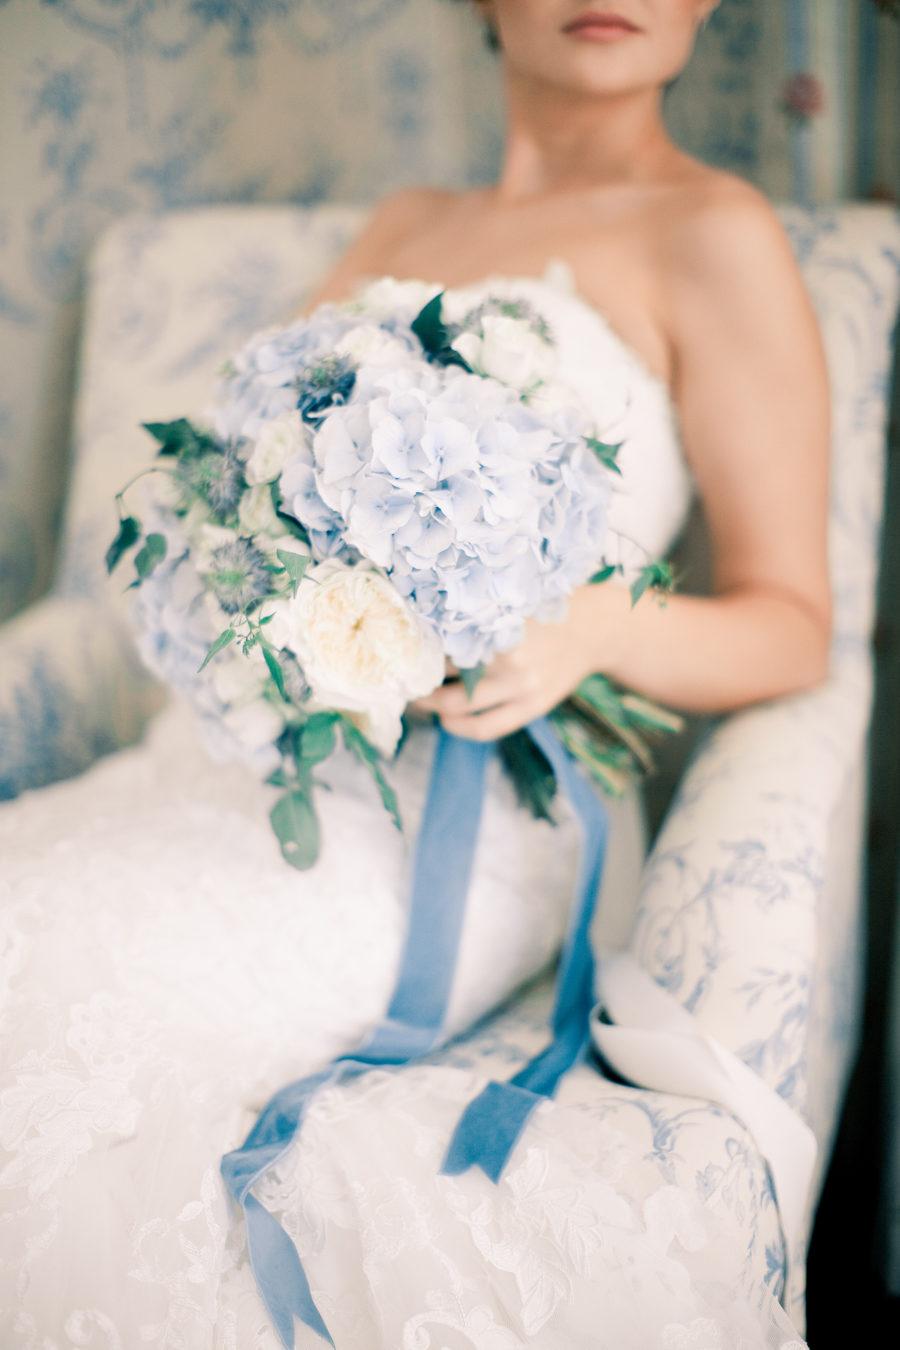 bride holding bouquet of hydrangea